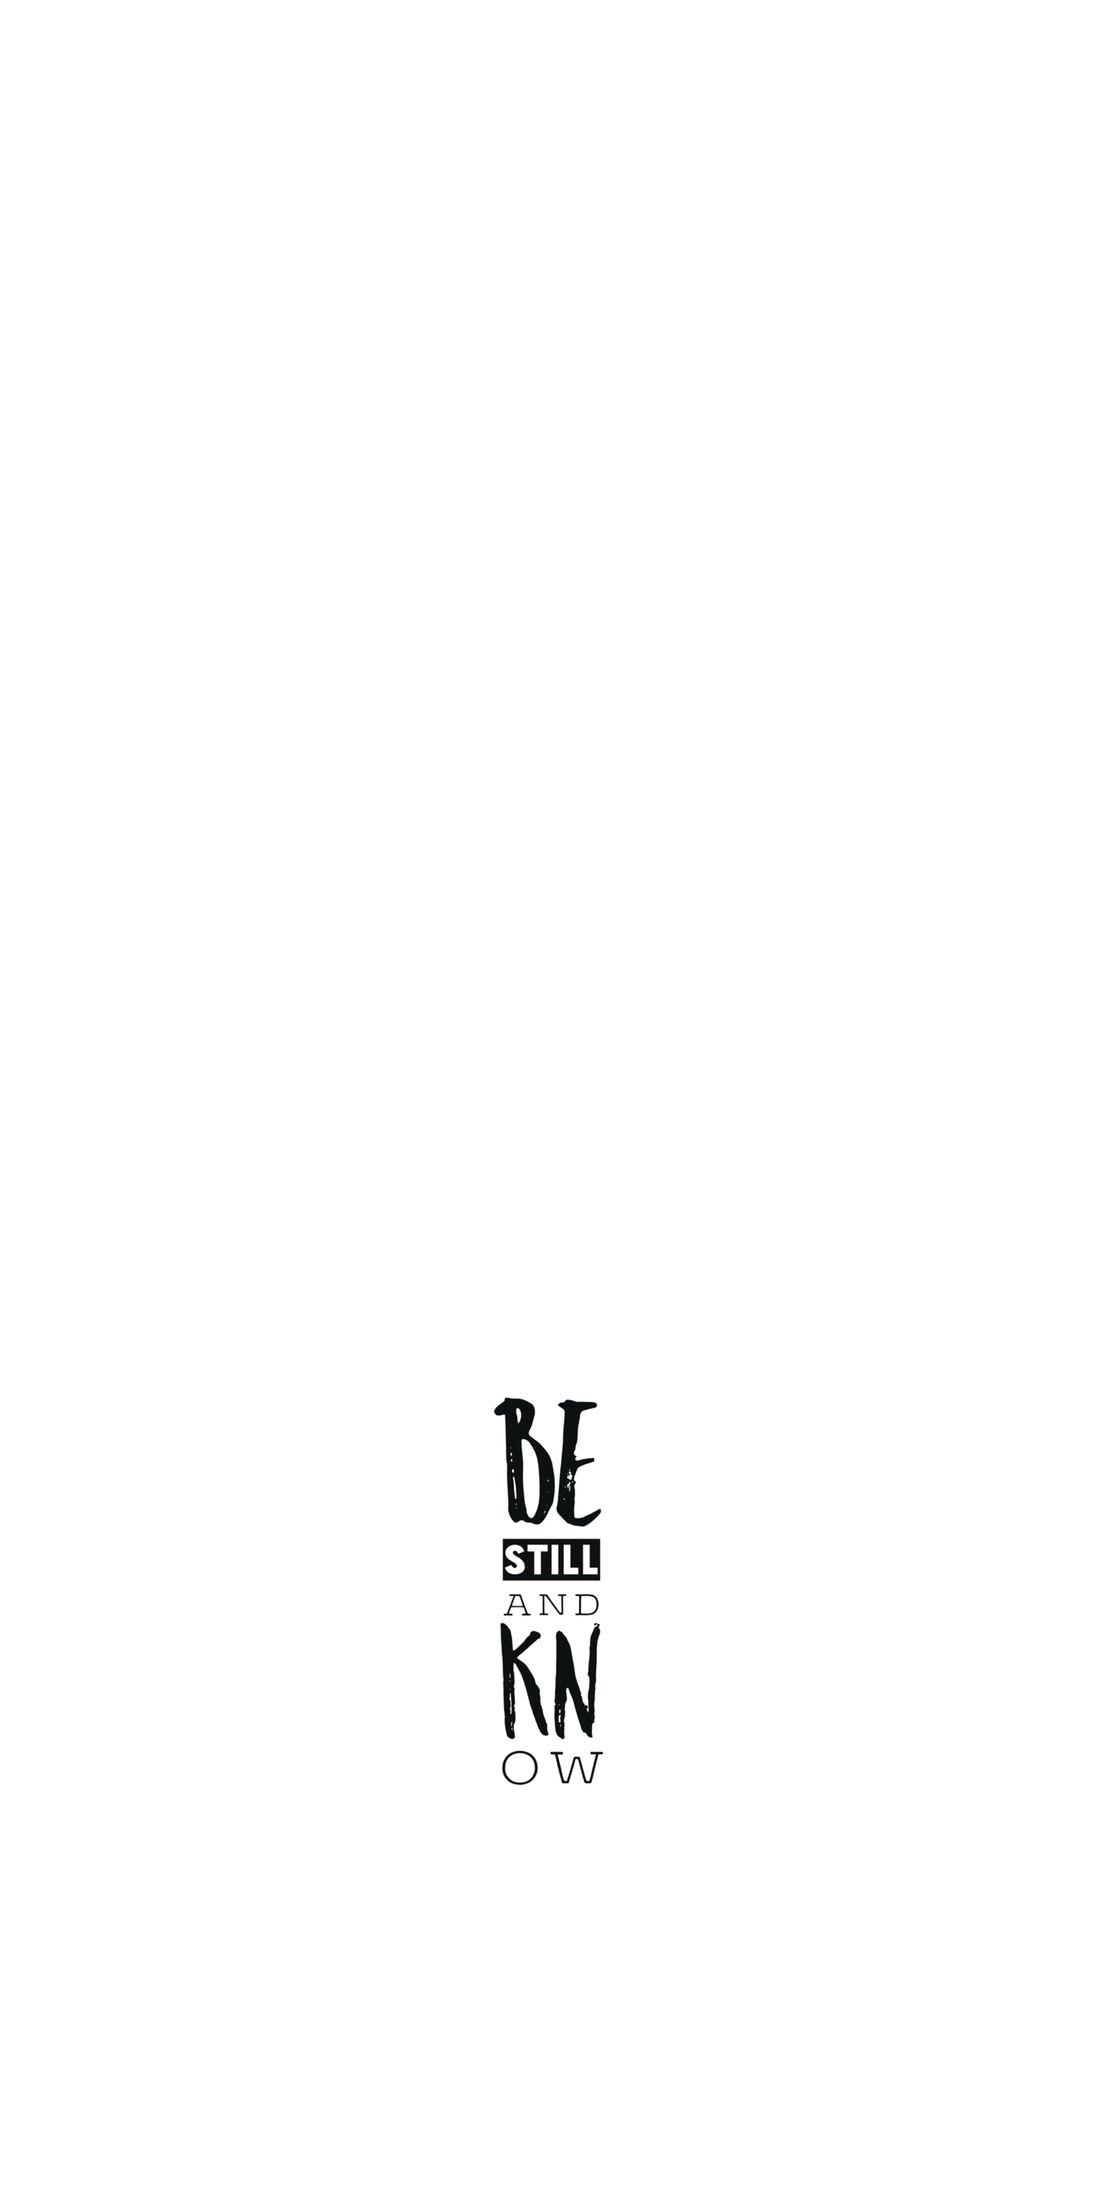 Pin By Jen Ylagan Napa On Wallpaper Verses Wallpaper Bible